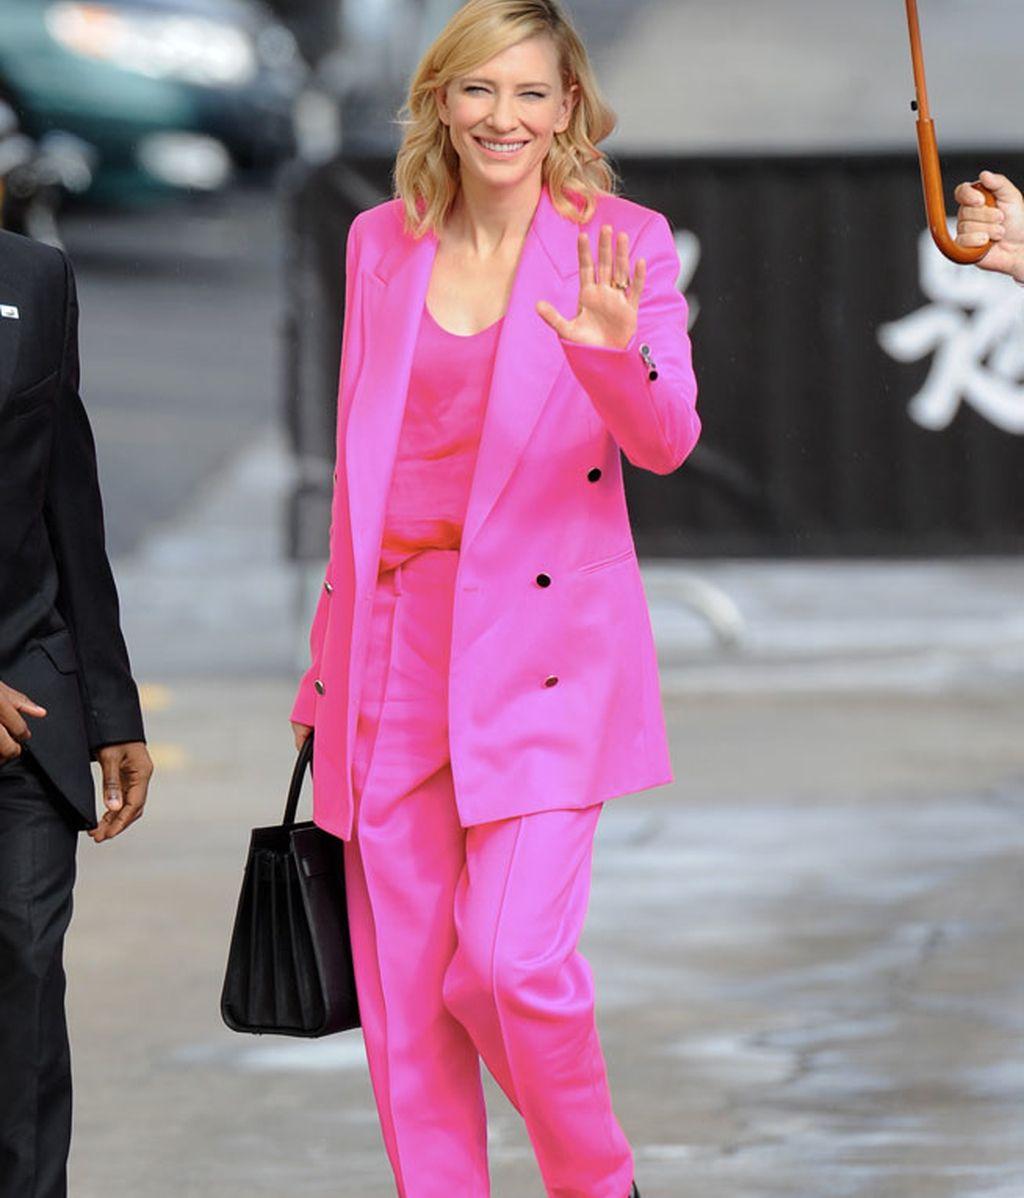 Traje con silueta 'oversize' de Edun en fucsia lució Cate Blanchett